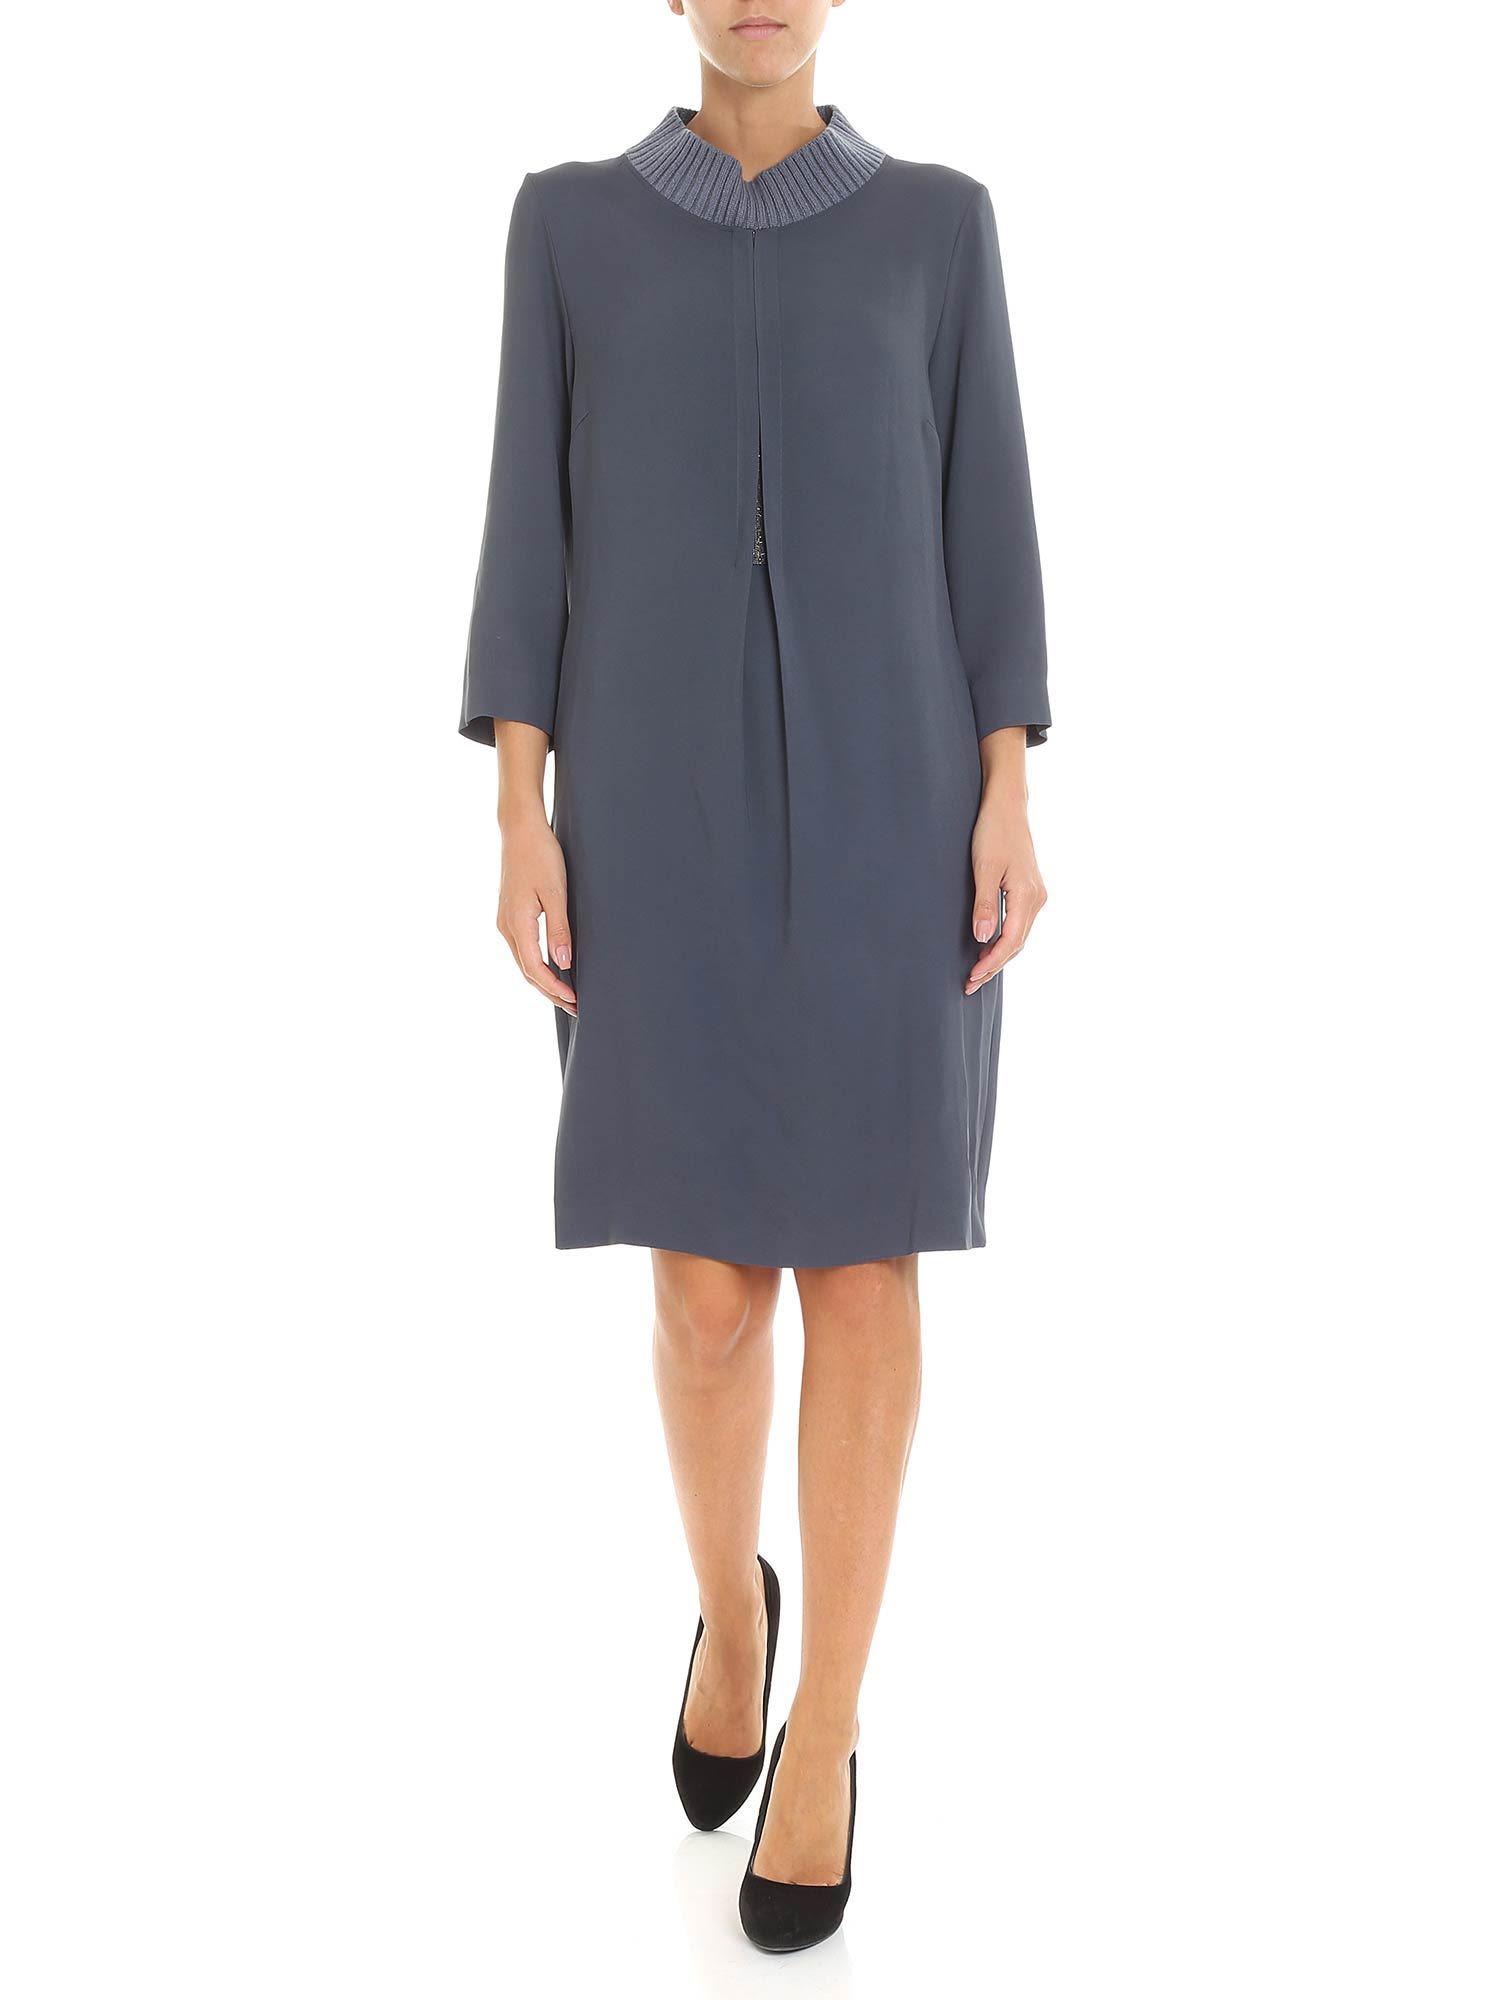 Fabiana Filippi Knitted Dress